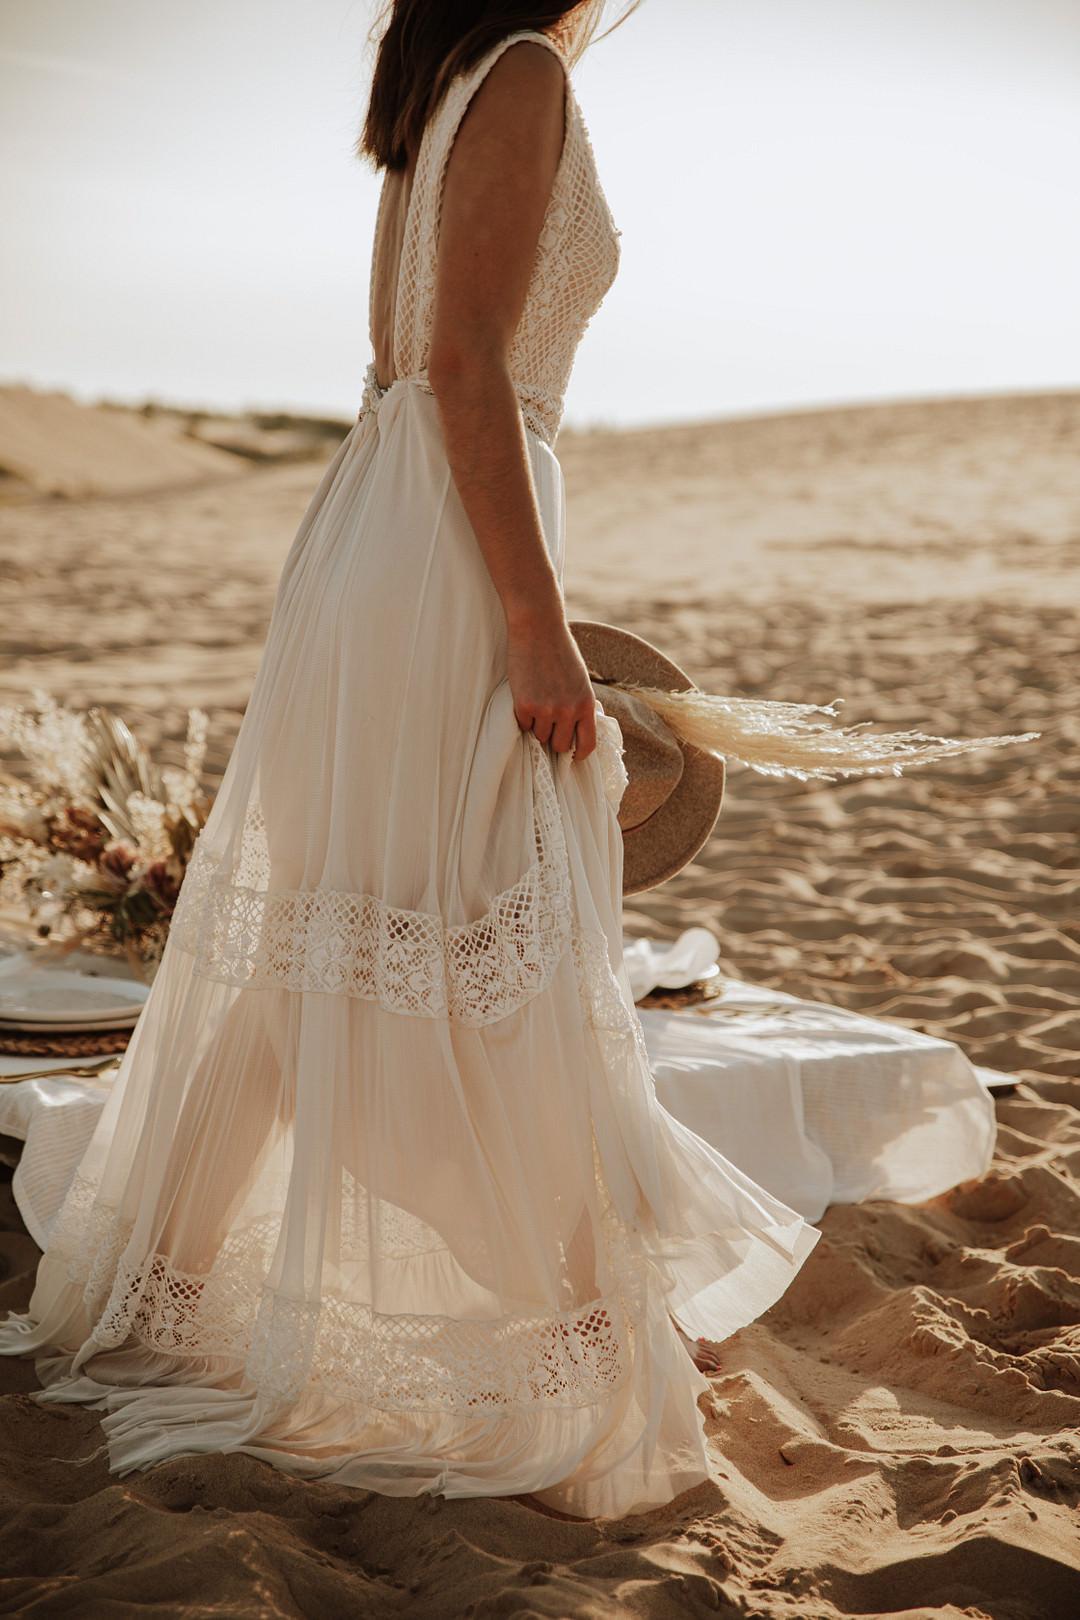 Bride Bridal Dress Gown Boho Bohemain Sheer Sand Dunes Wedding Photos By Gayle